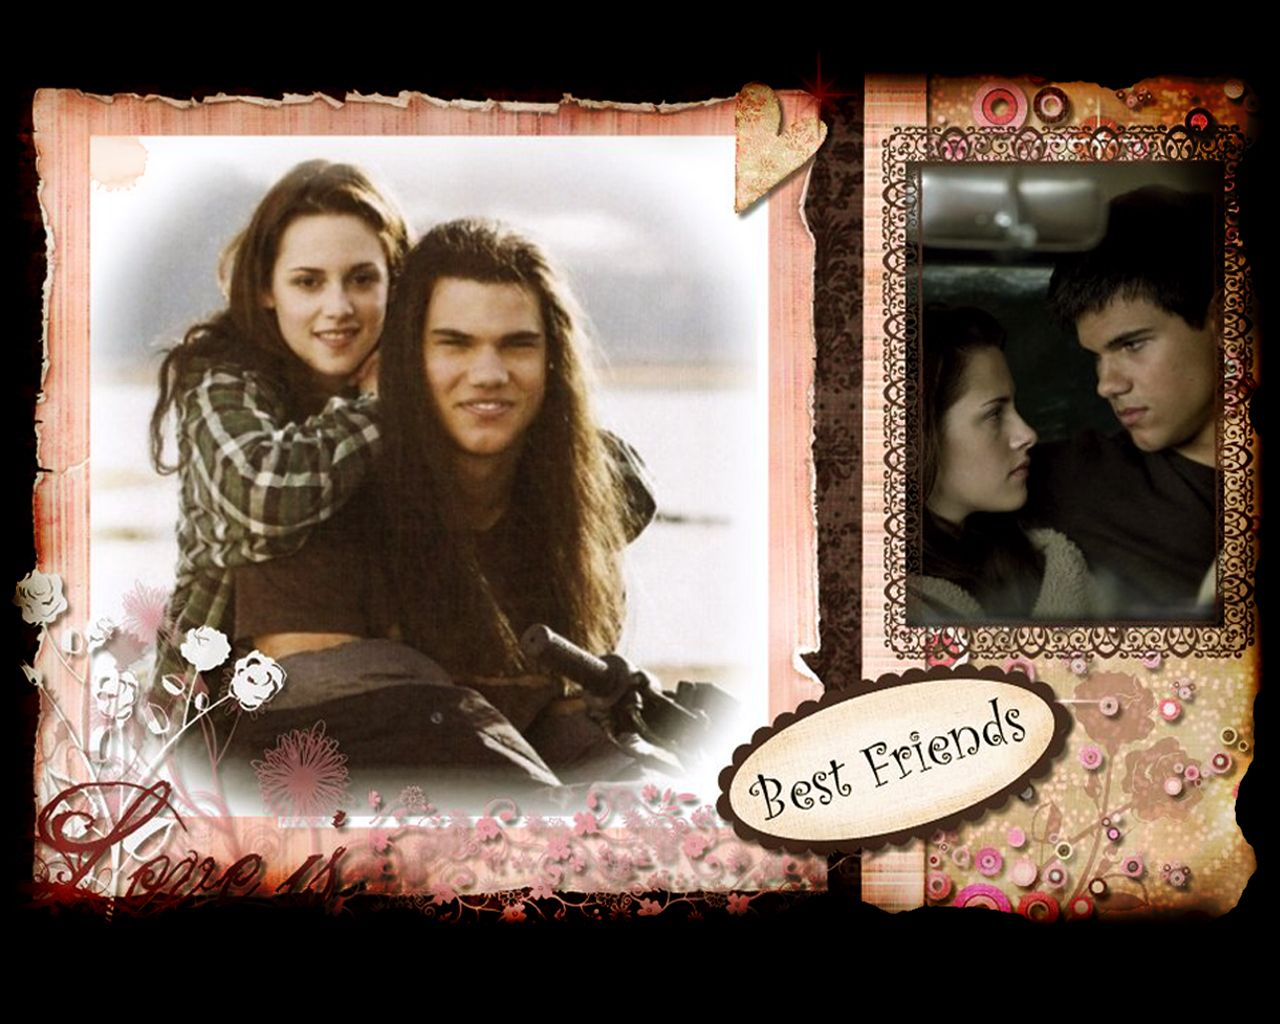 Scrapbook ideas for best friend - Jacob And Bella Best Friends Scrapbook Page 1280x1024 Photo